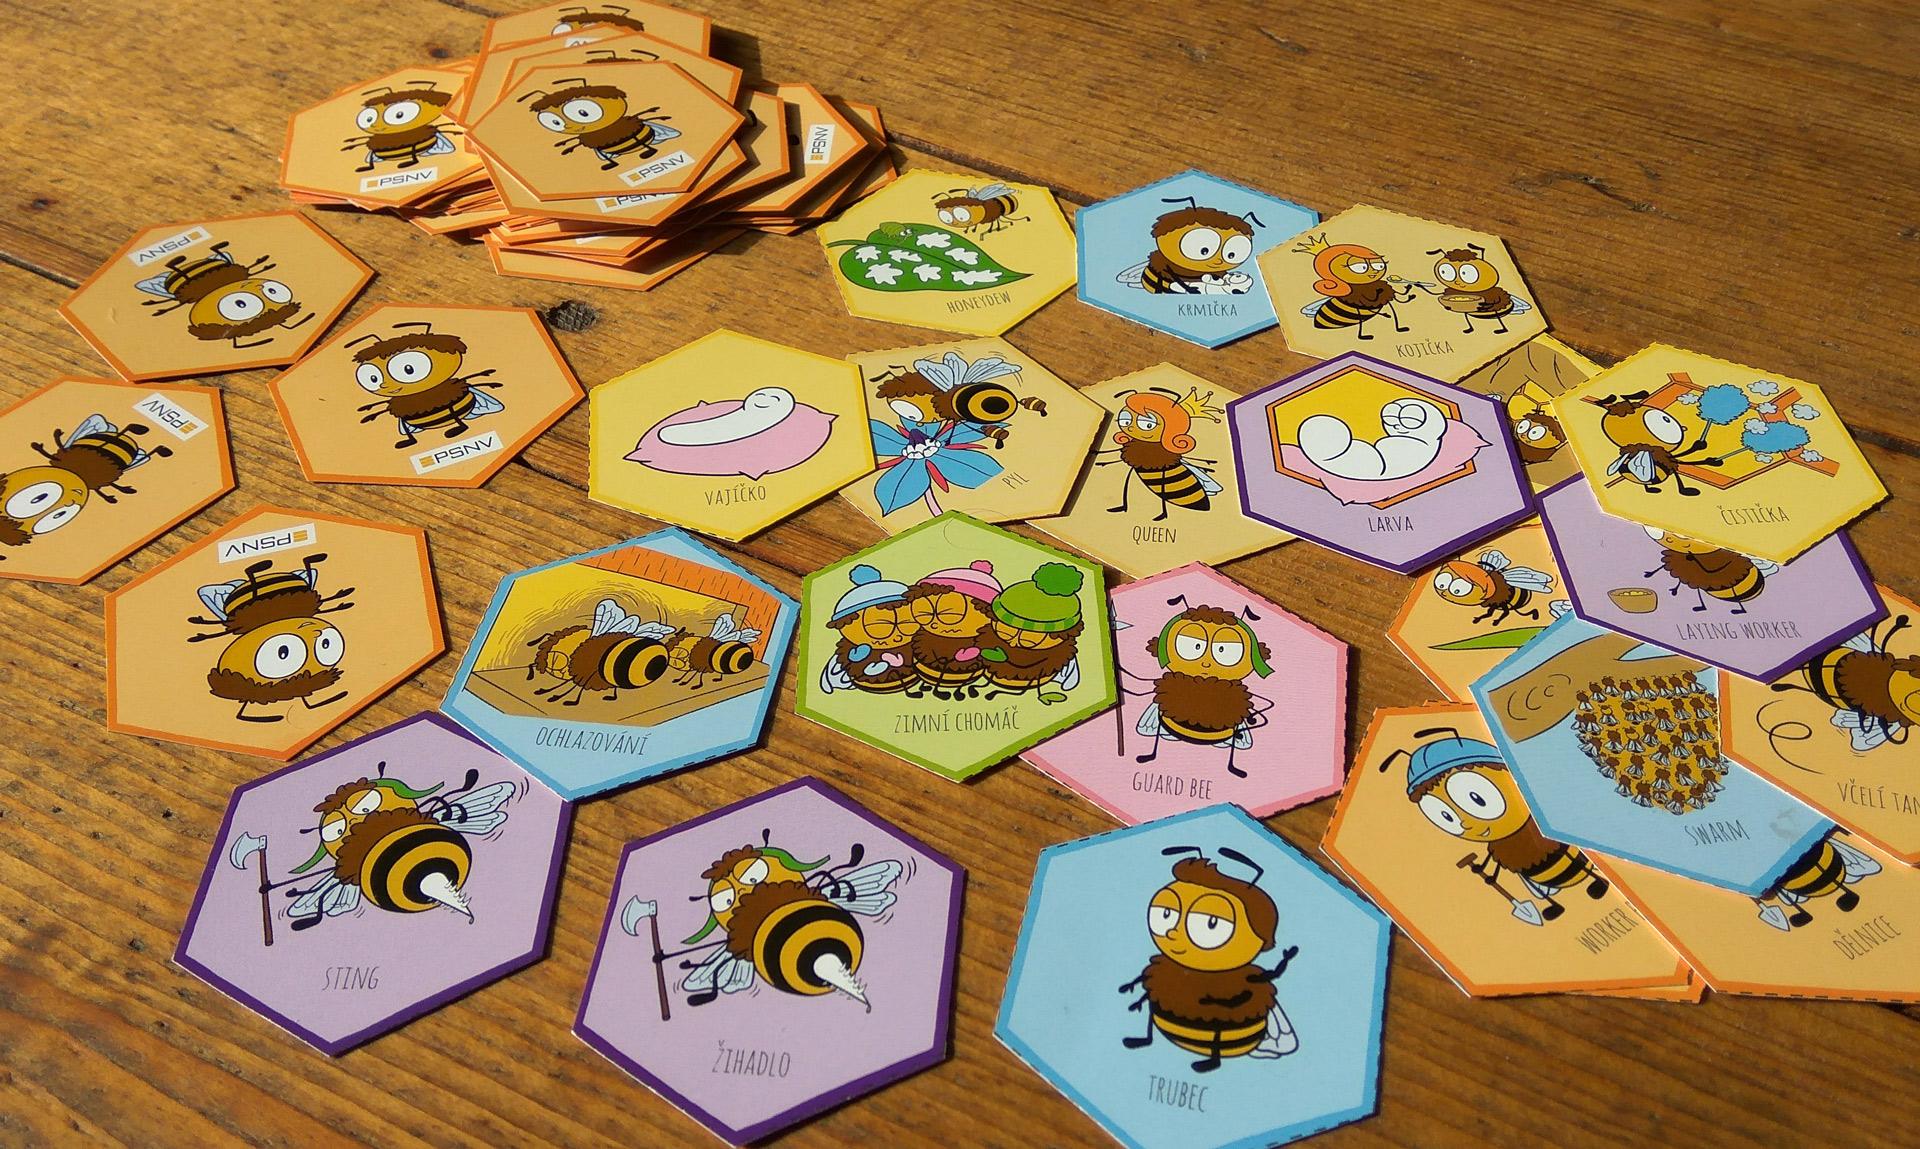 Pojďte pane, budeme si hrát se včelím pexesem!